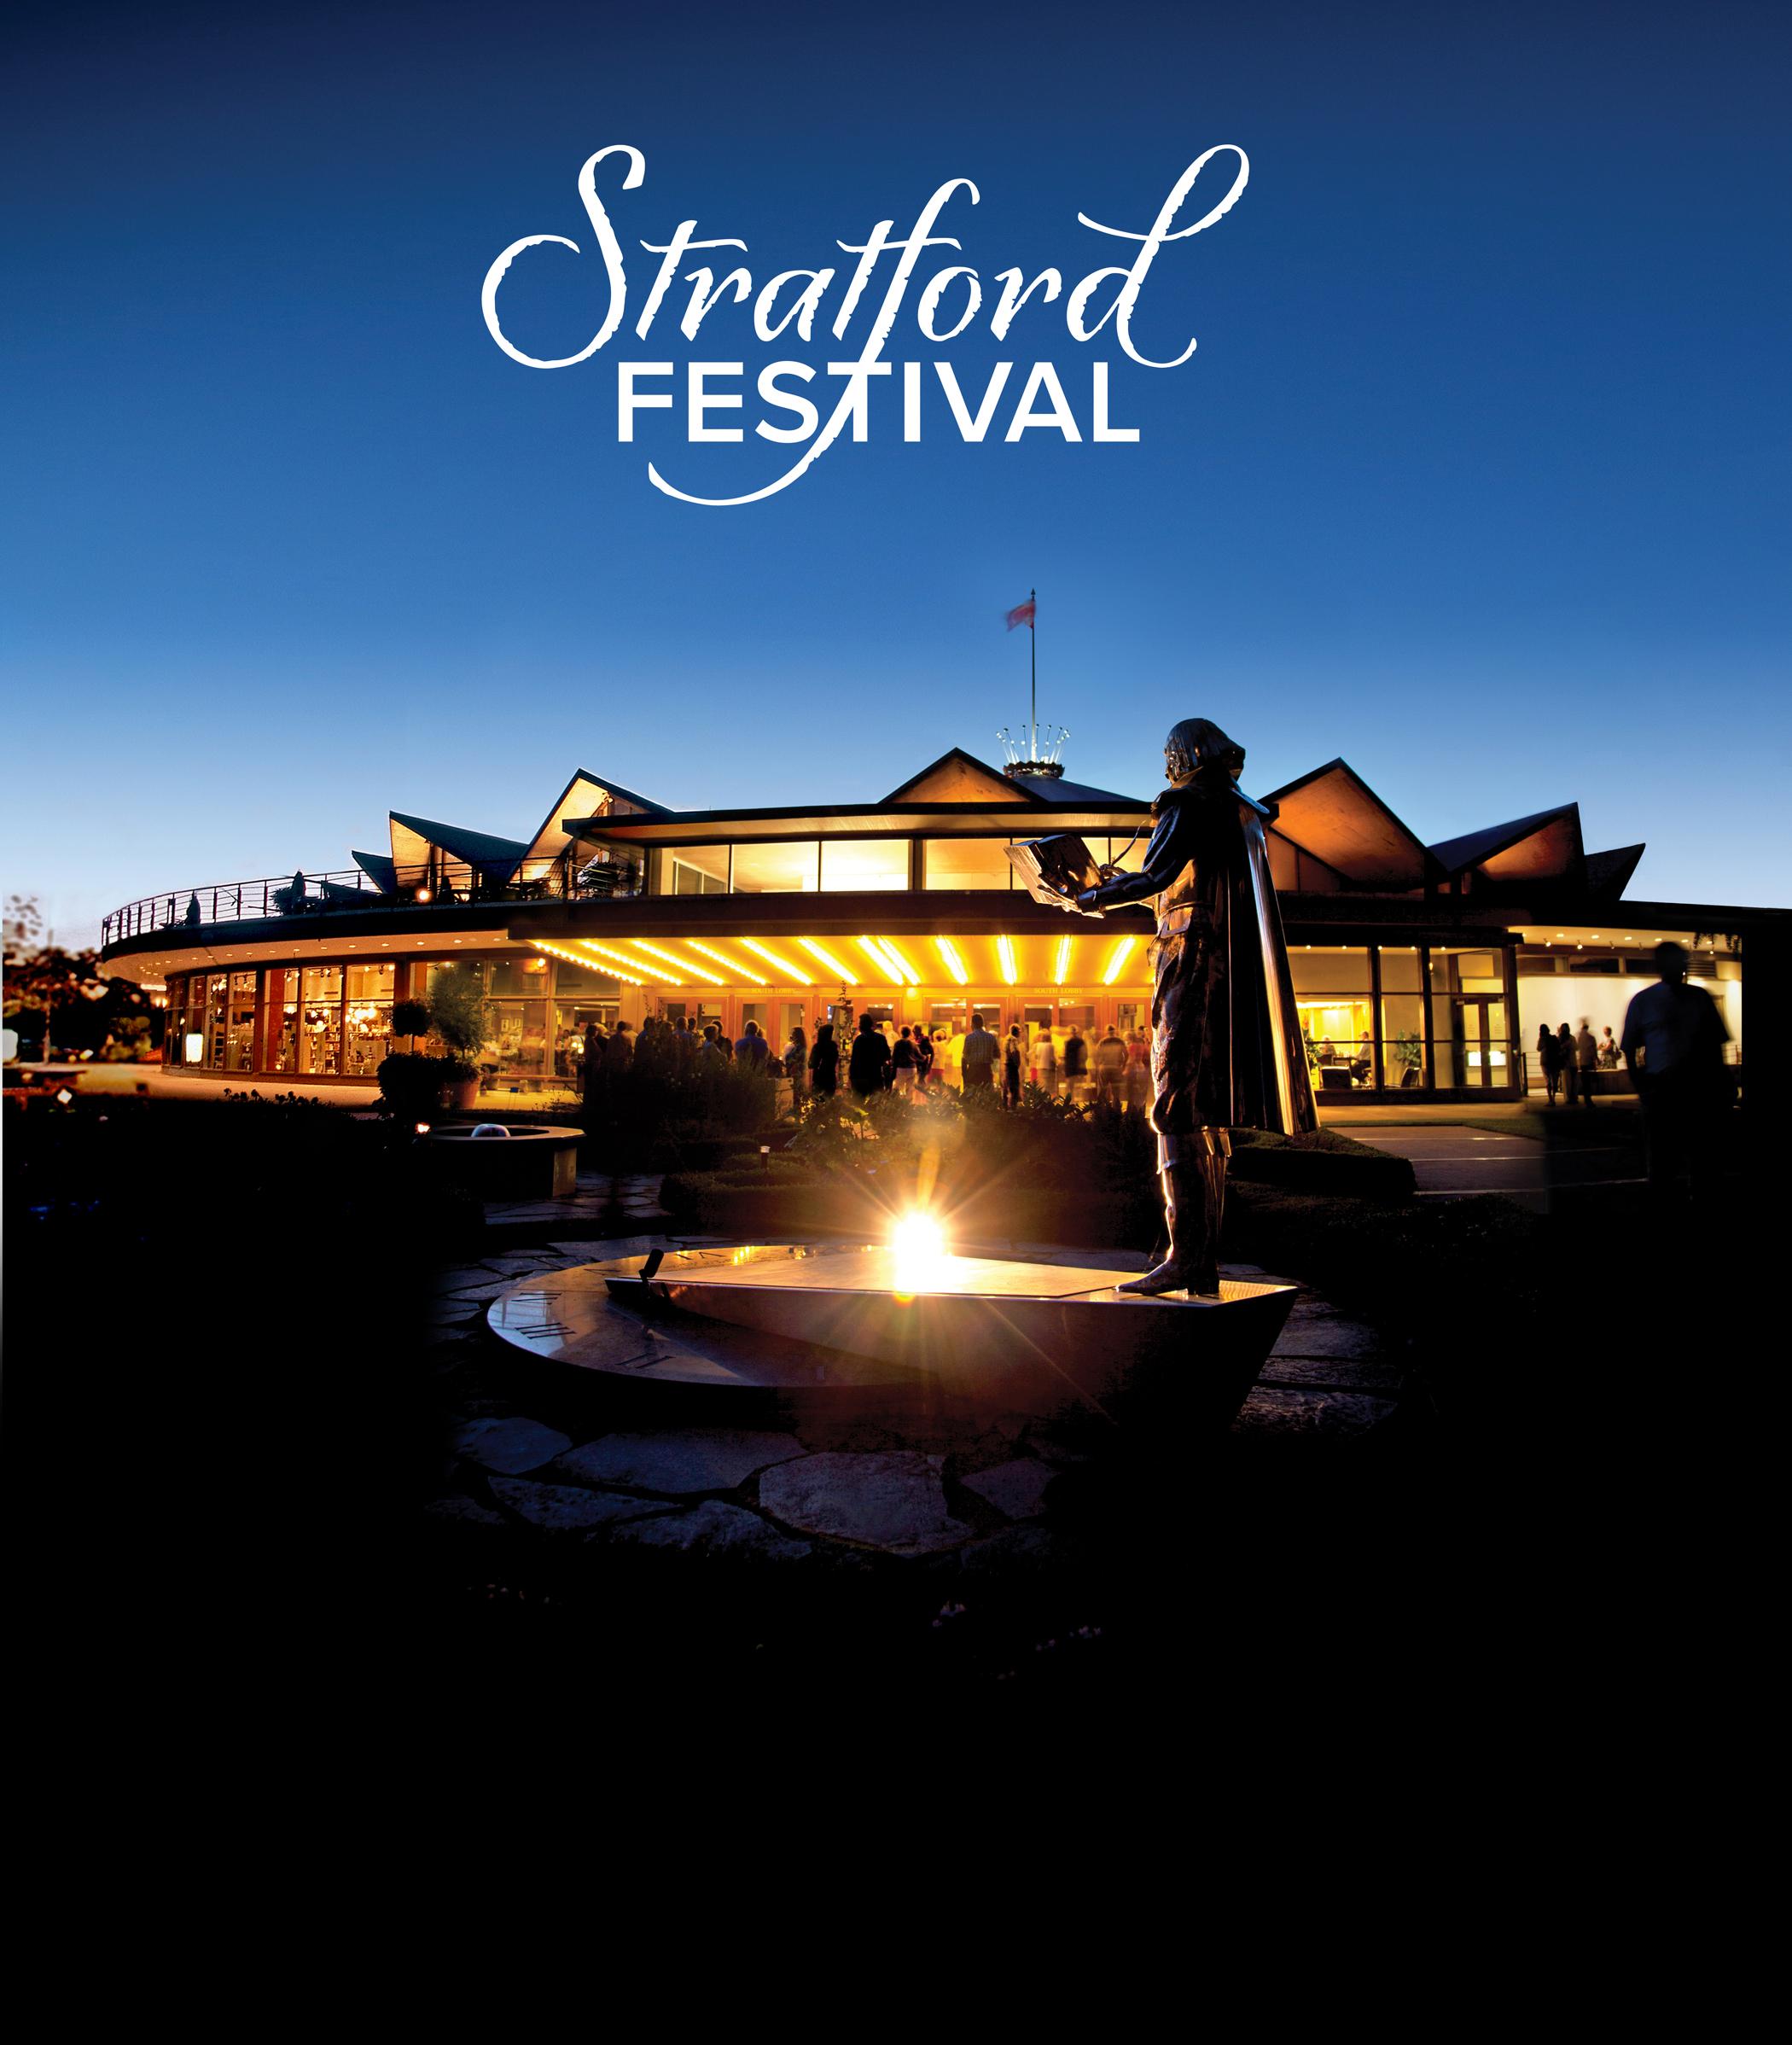 Resultado de imagen para stratford festival